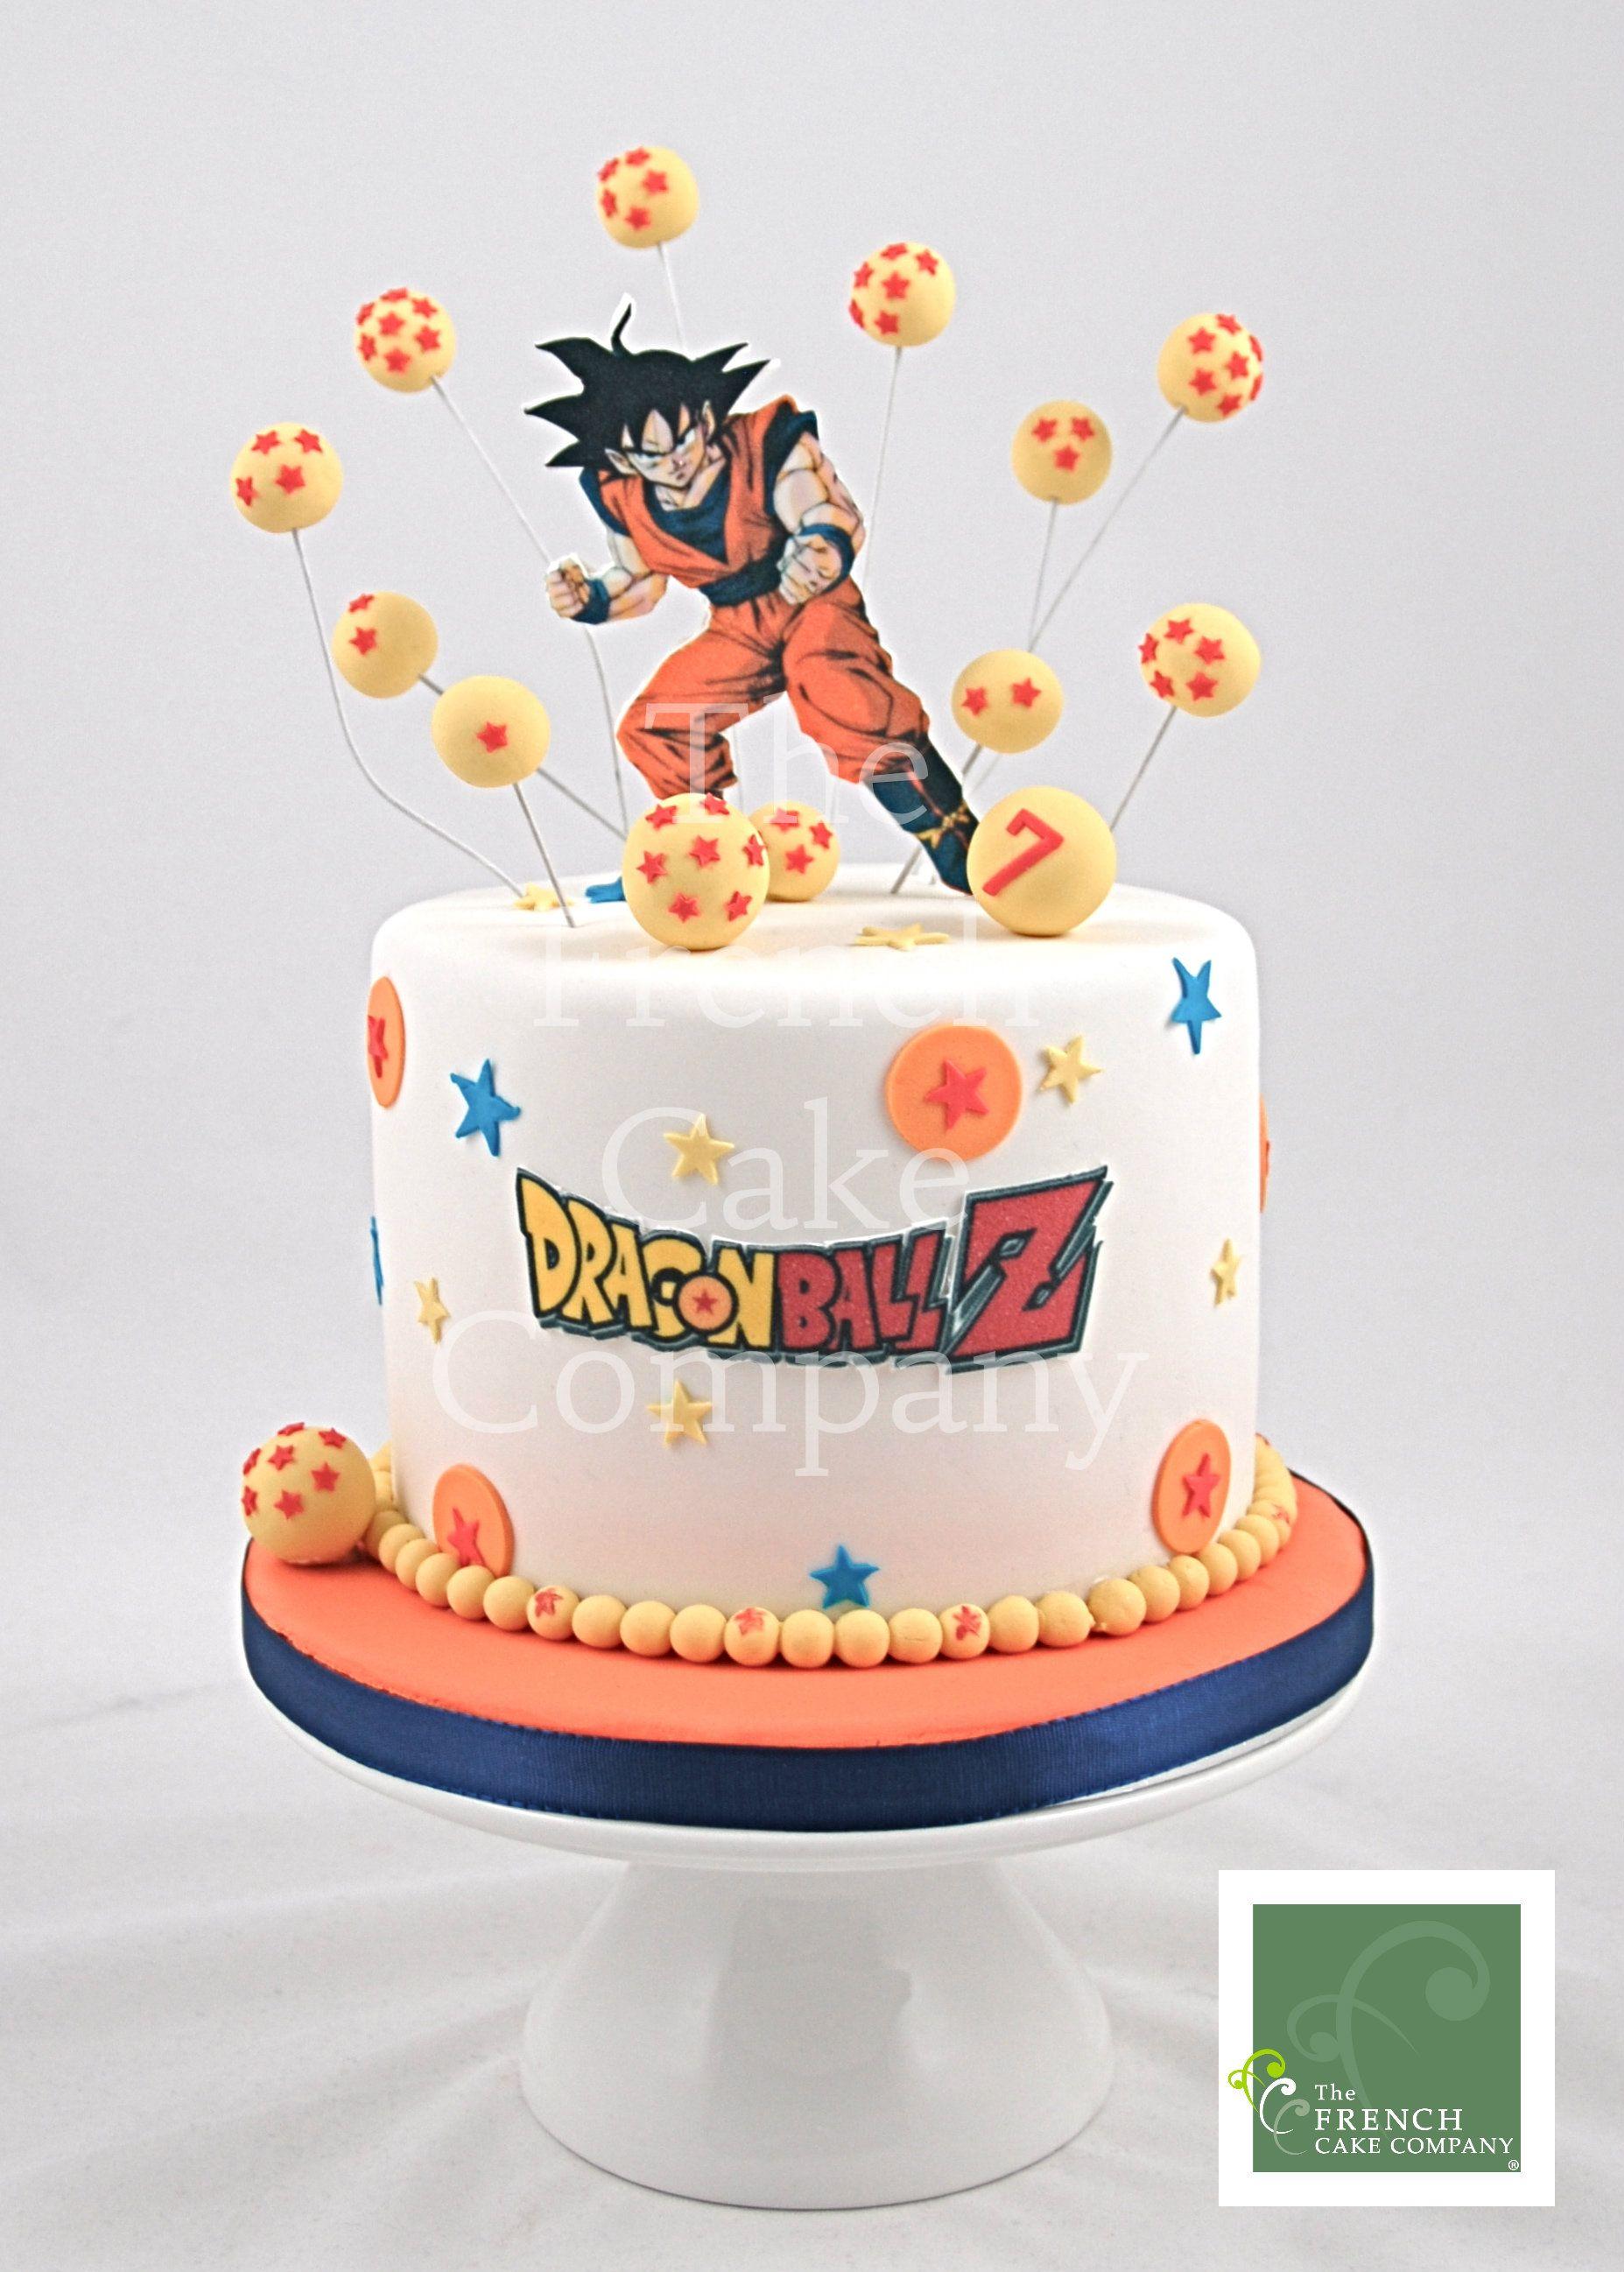 Childrens birthday cake dragonball z gateau duanniversaire pour